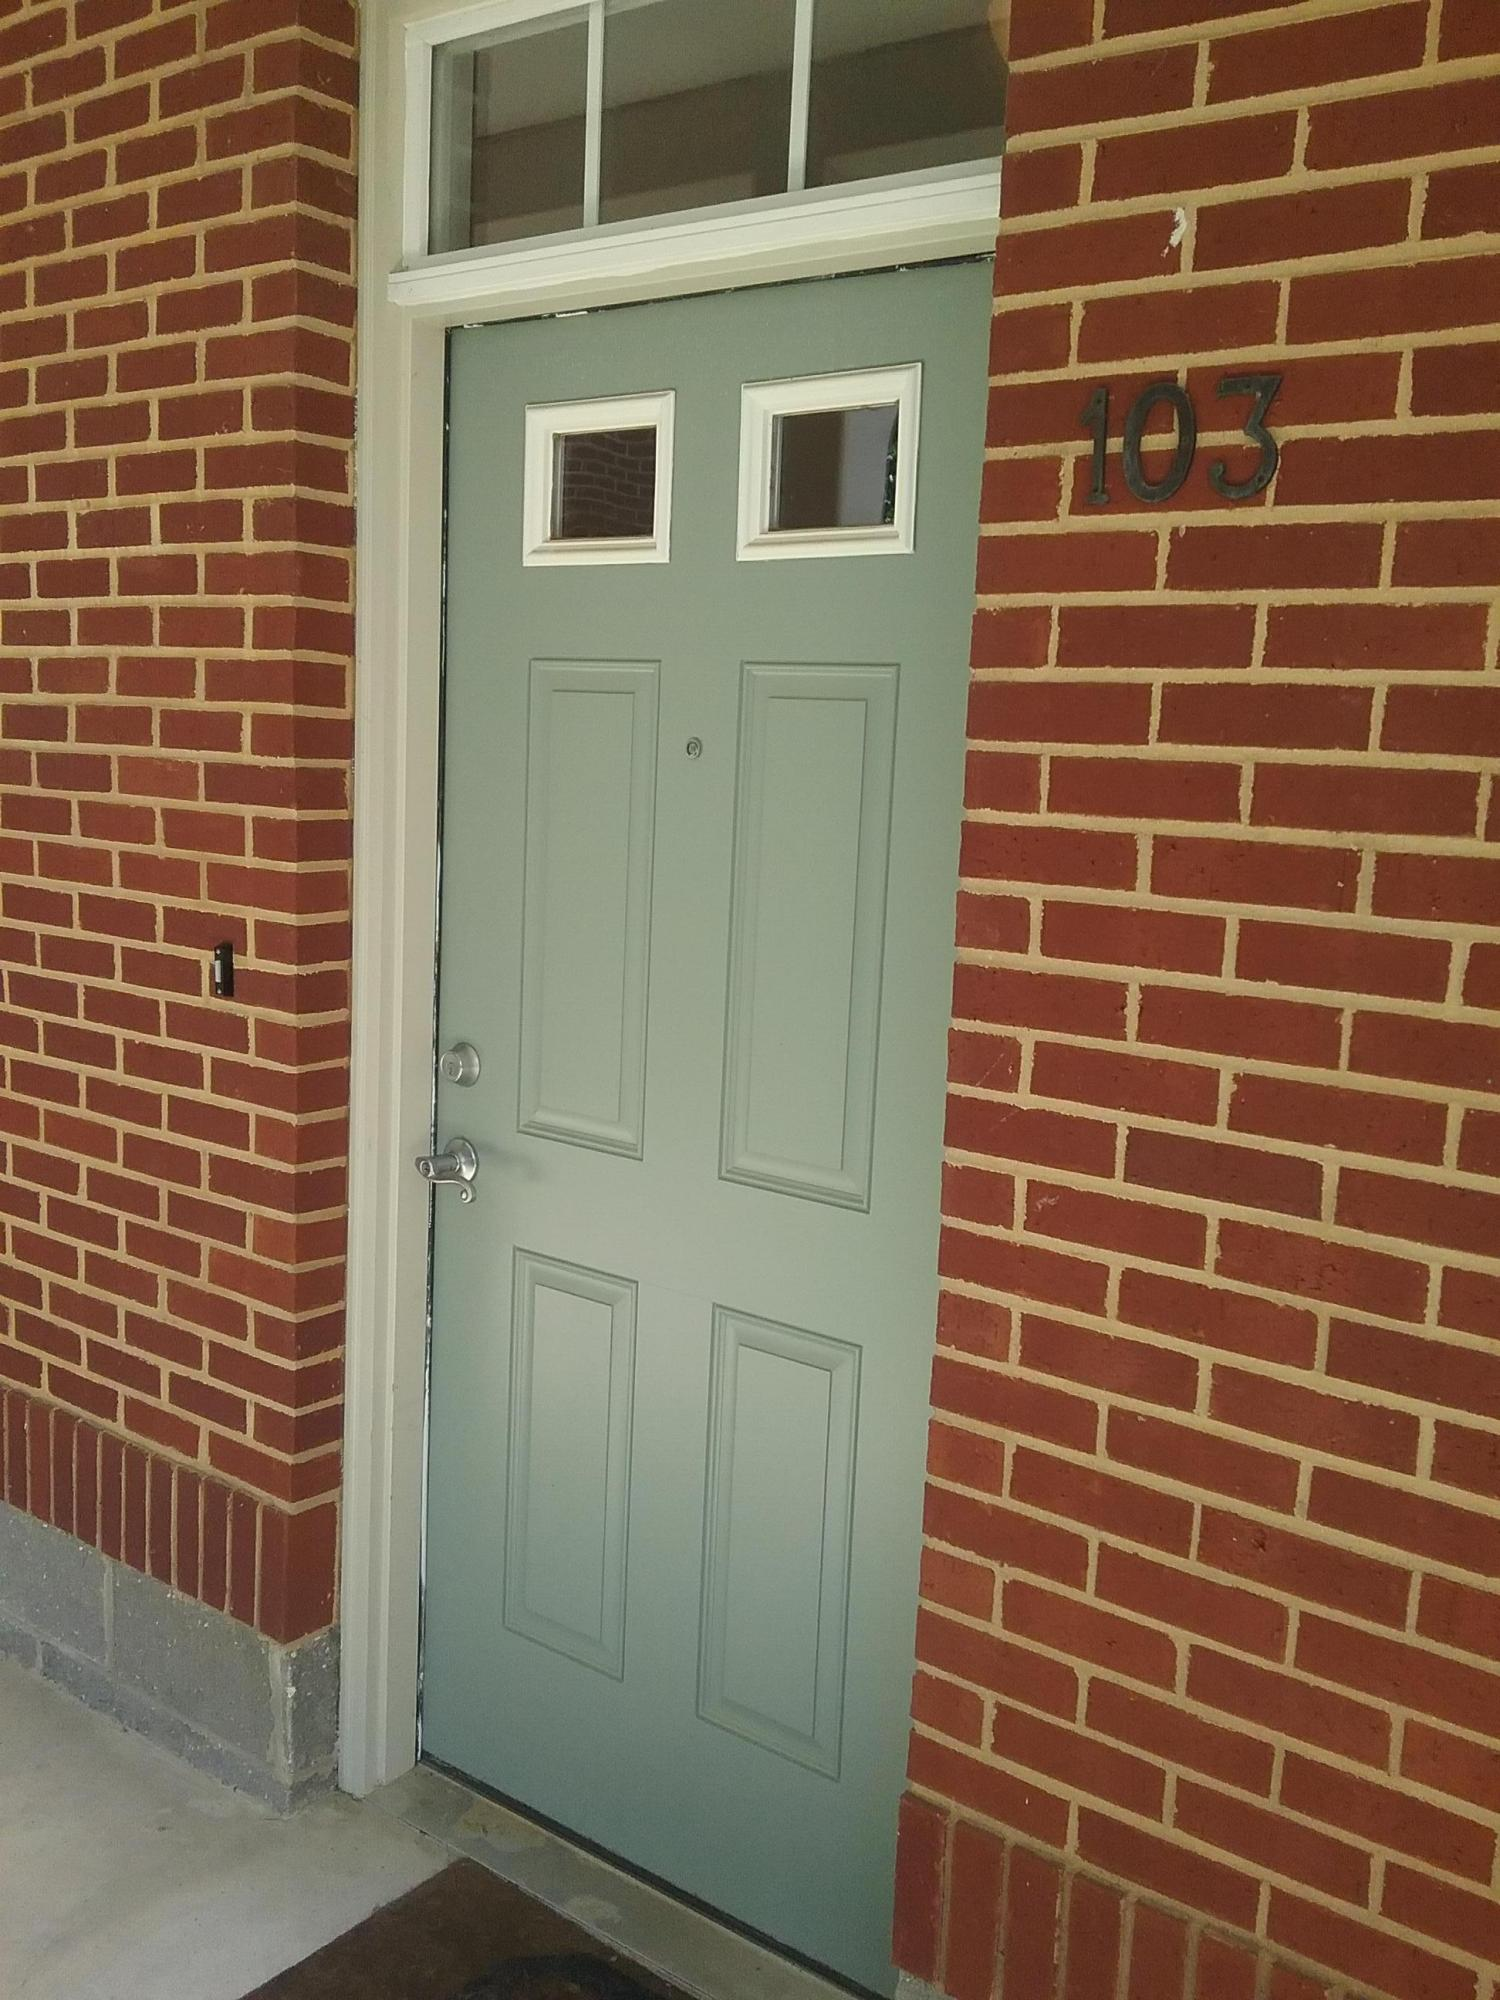 Ballards Pointe II Homes For Sale - 103 Ballard, Santee, SC - 40